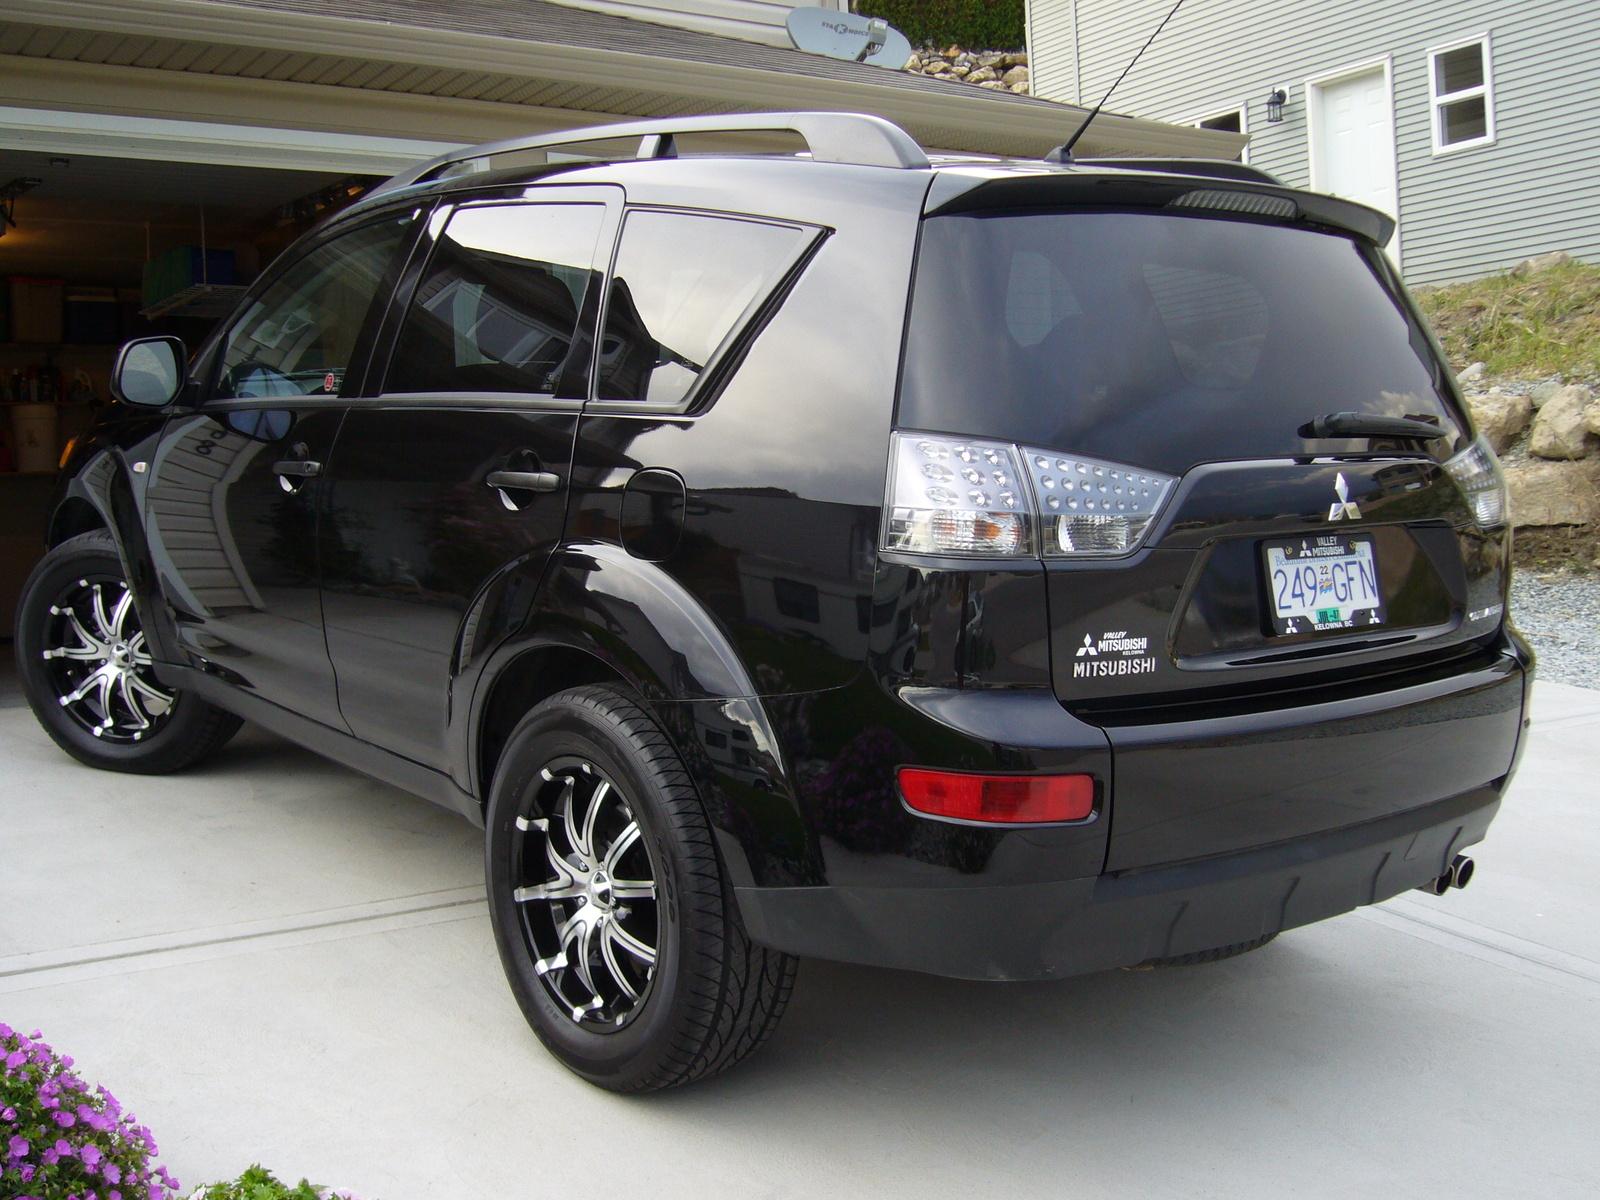 2007 Mitsubishi Outlander Pictures Cargurus